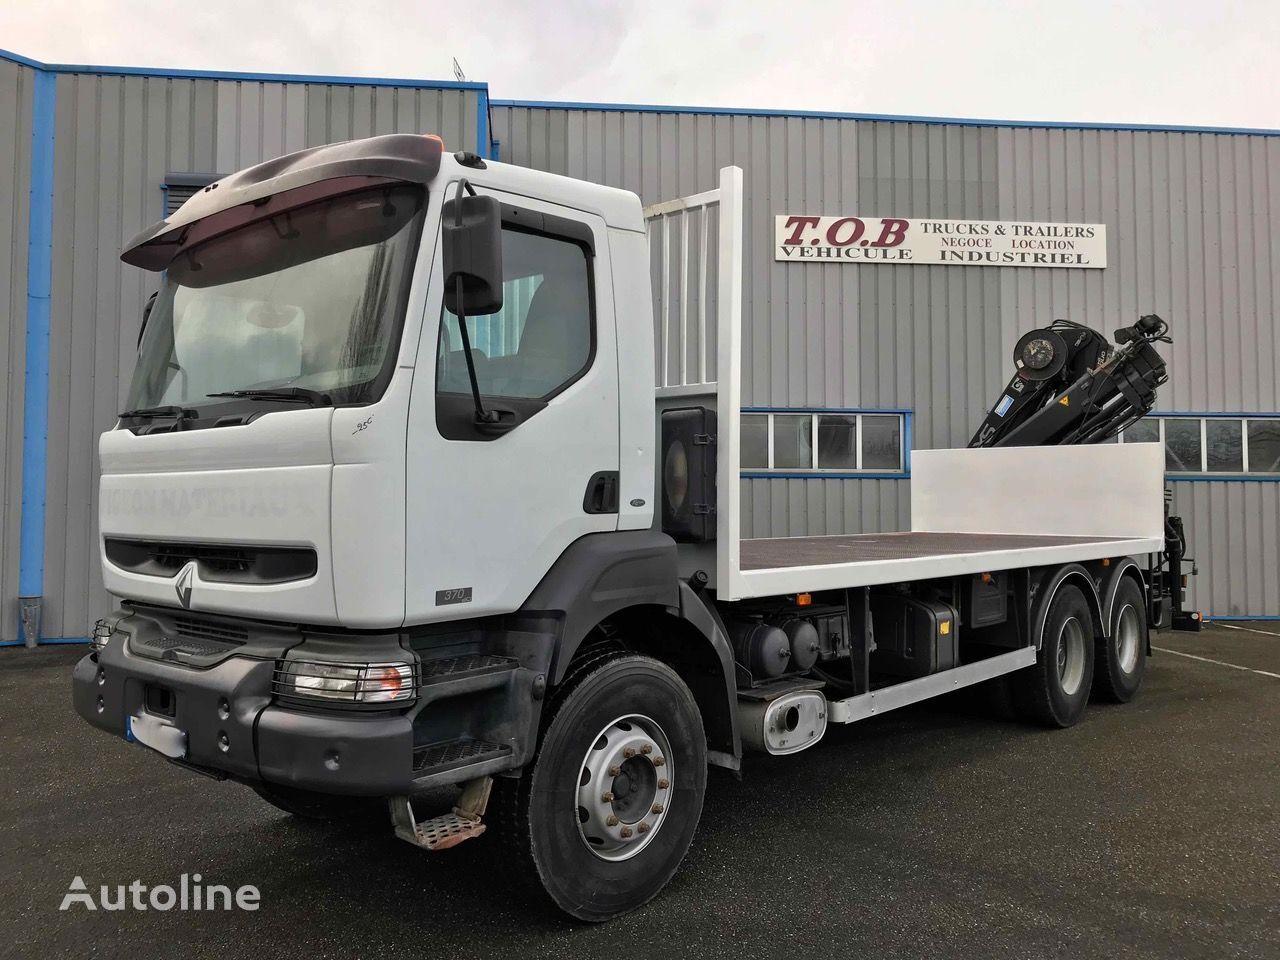 RENAULT KERAX 370 6X4 2005 PLATEAU GRUE HIAB 166 DS4 DUO 12M30 RADIOCOMM flatbed truck